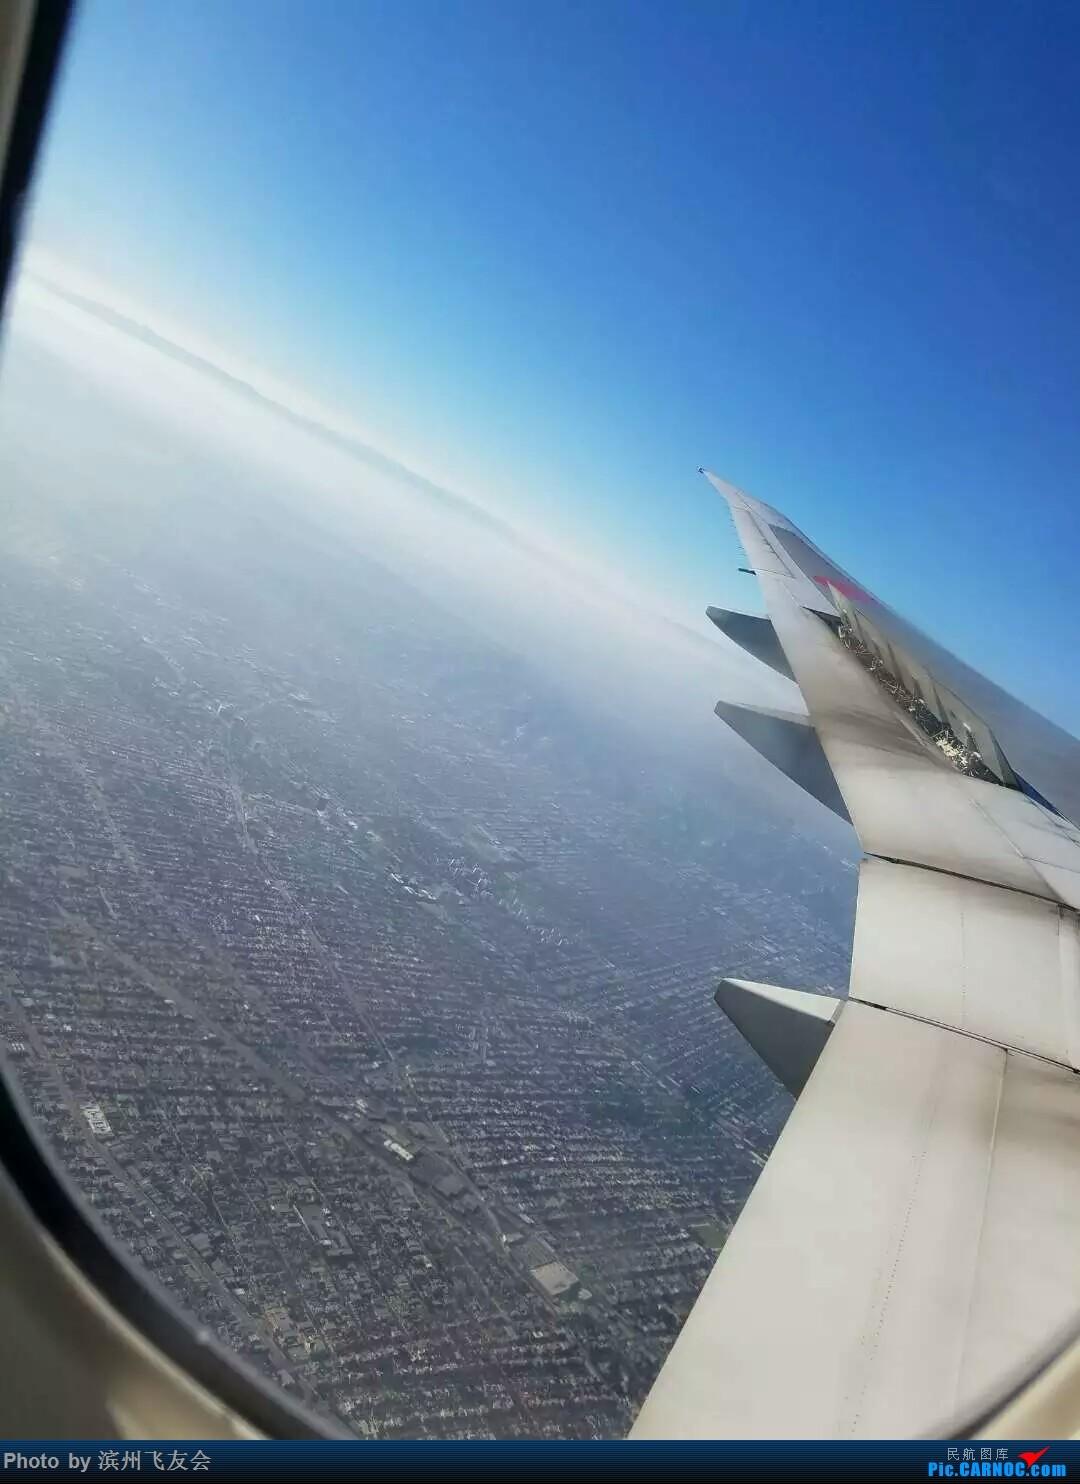 Re:[原创]全日空美国游记2-东京羽田,洛杉矶 BOEING 777-200ER  洛杉矶国际机场东